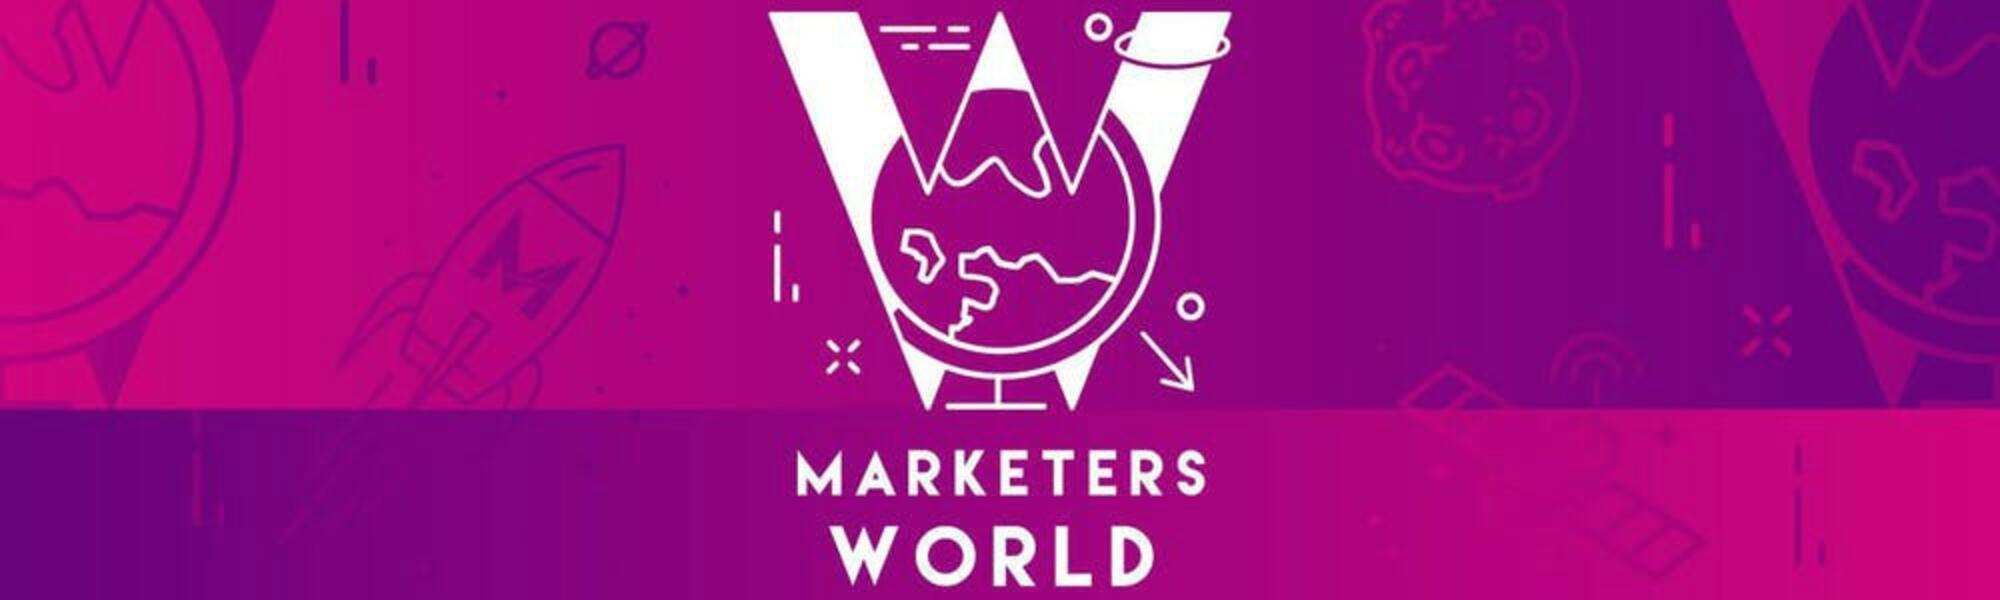 Offerta Dario Vignali Marketers World 18-20 ottobre 2019 Rimini Palacongressi